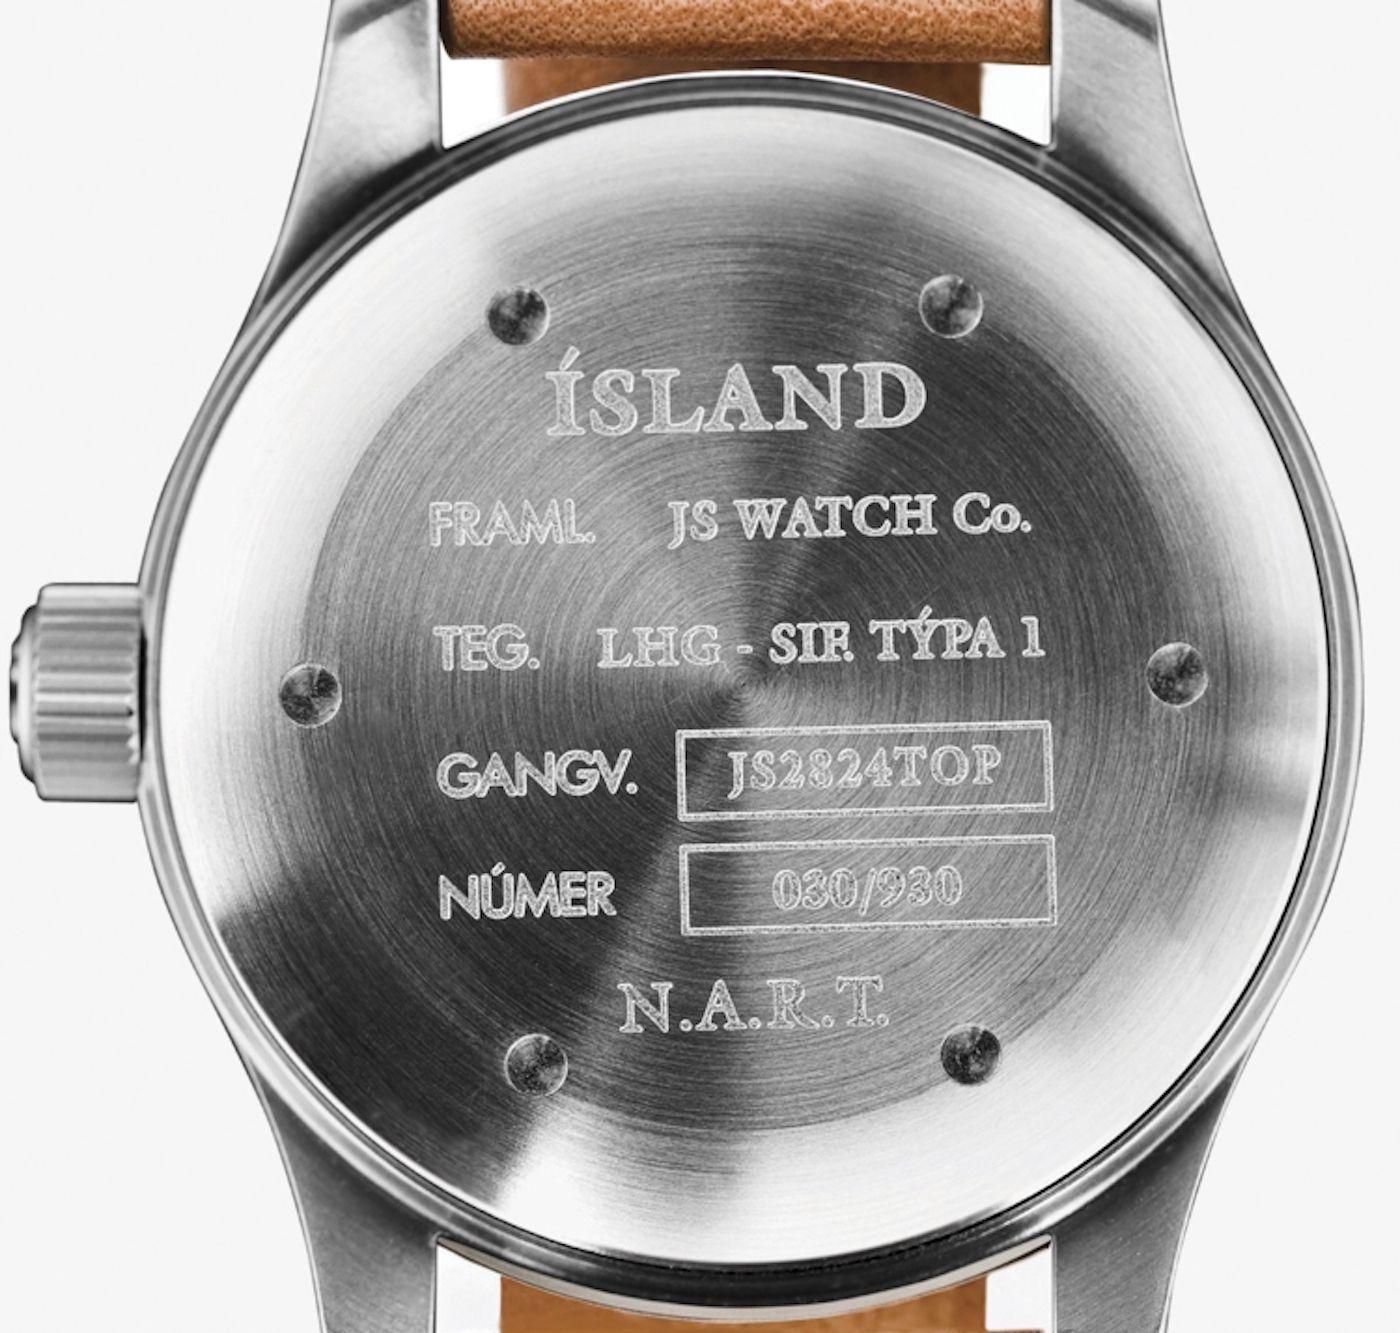 JS Watch Company